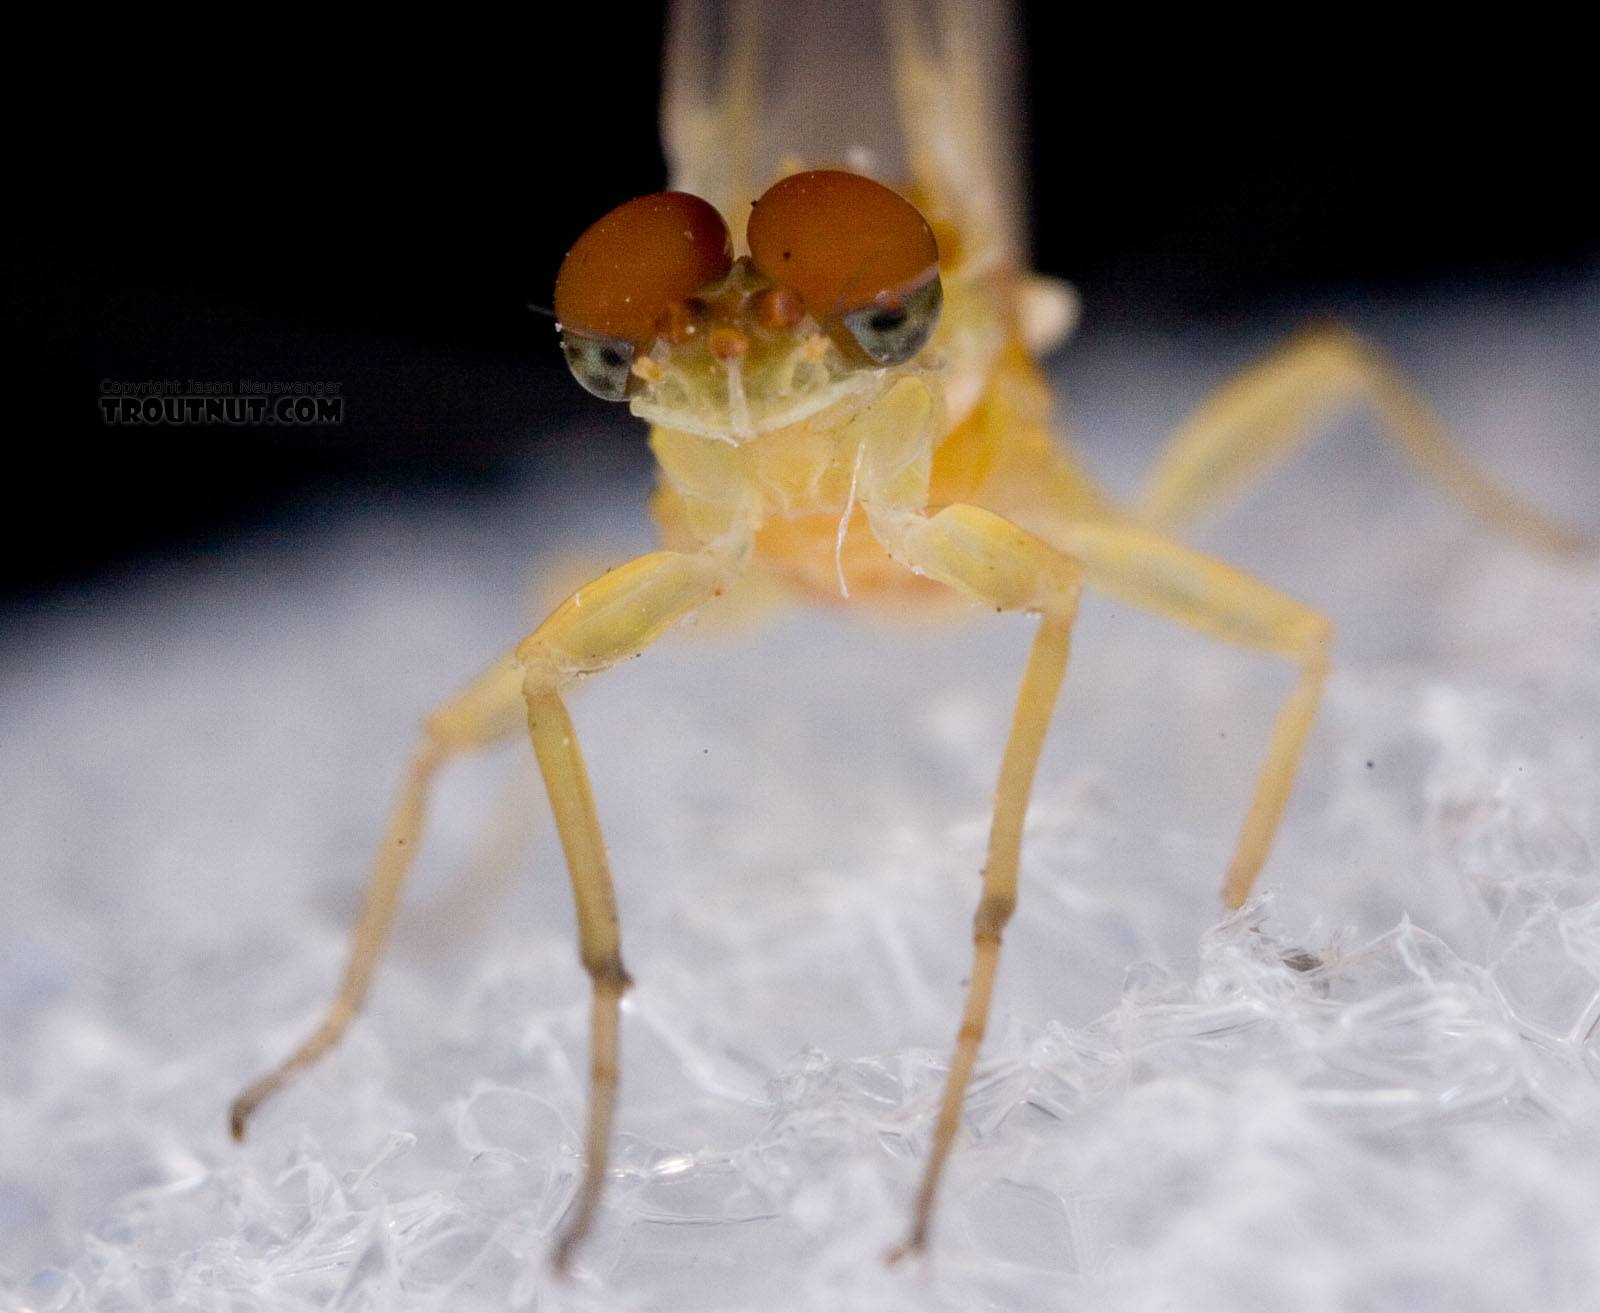 Male Ephemerella invaria (Sulphur Dun) Mayfly Dun from Penn's Creek in Pennsylvania